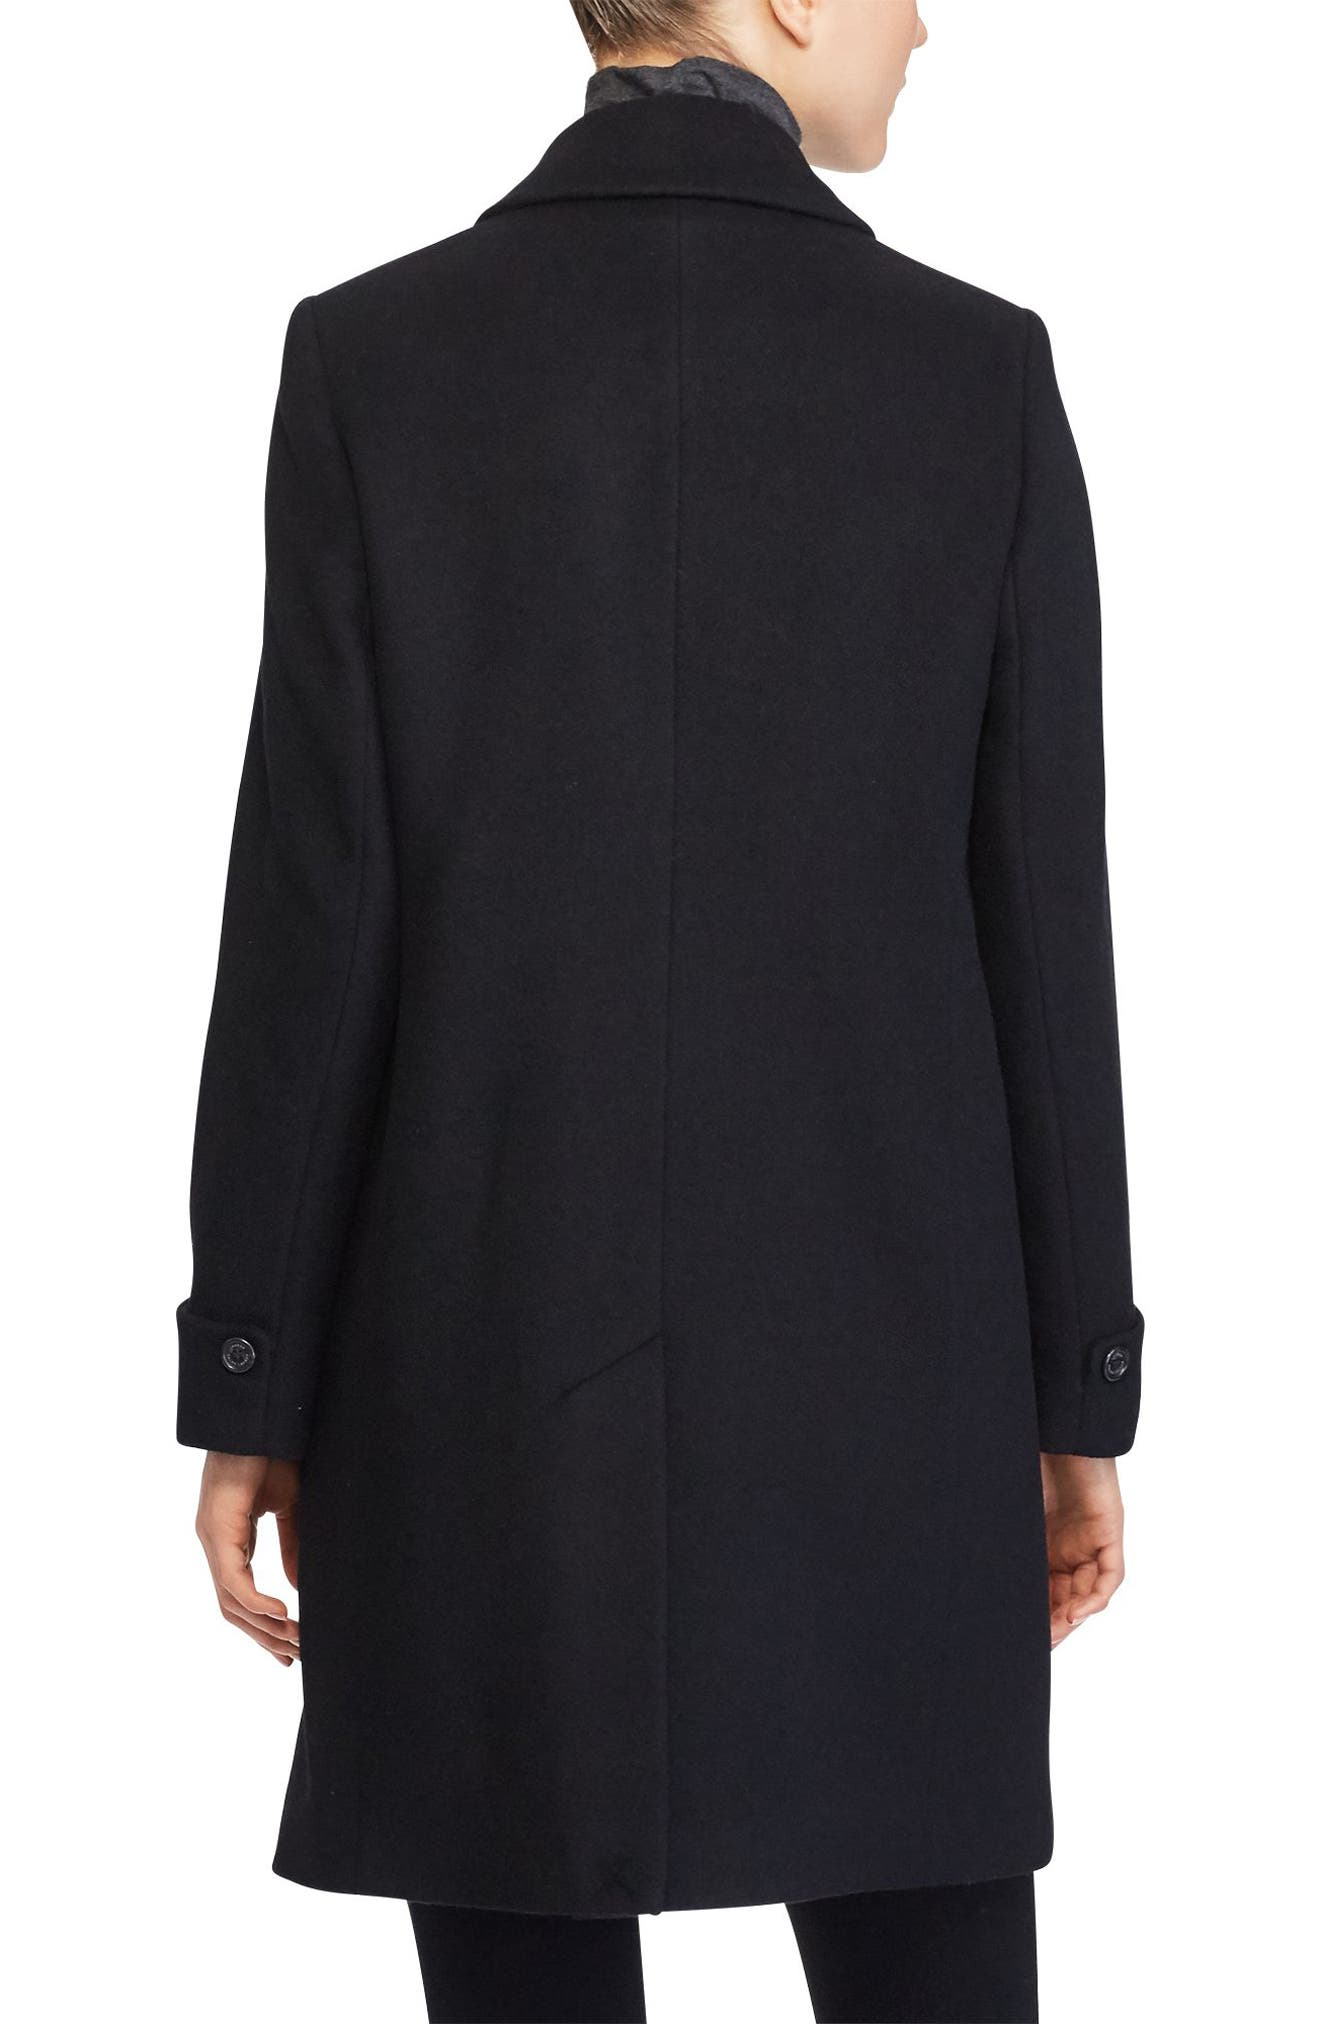 Wool Blend Coat,                             Alternate thumbnail 2, color,                             001